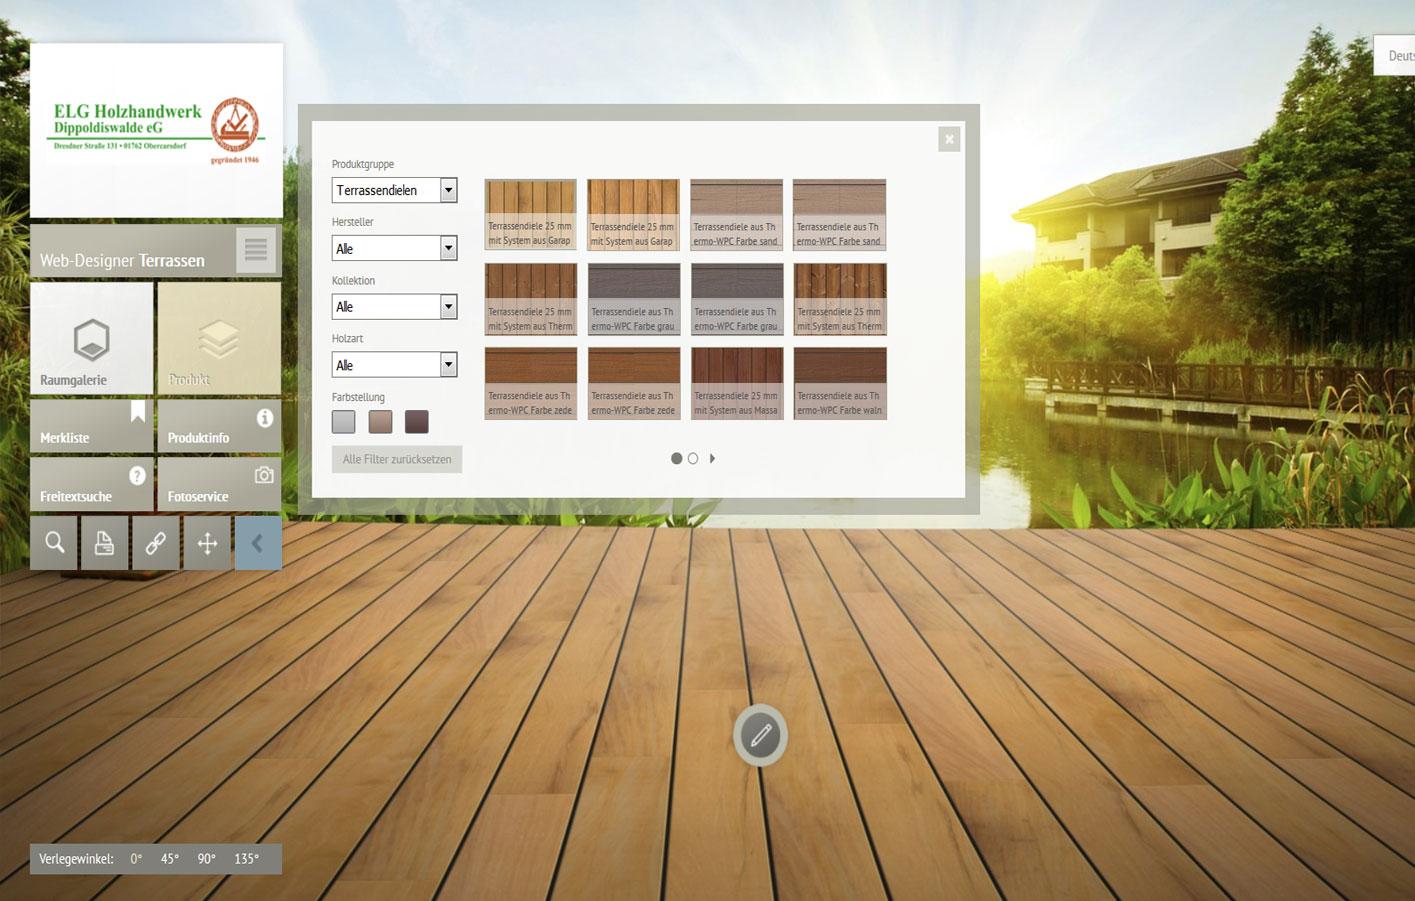 osb kvh bsh parkett t ren terrasse f r dippoldiswalde obercarsdorf dresden pirna. Black Bedroom Furniture Sets. Home Design Ideas